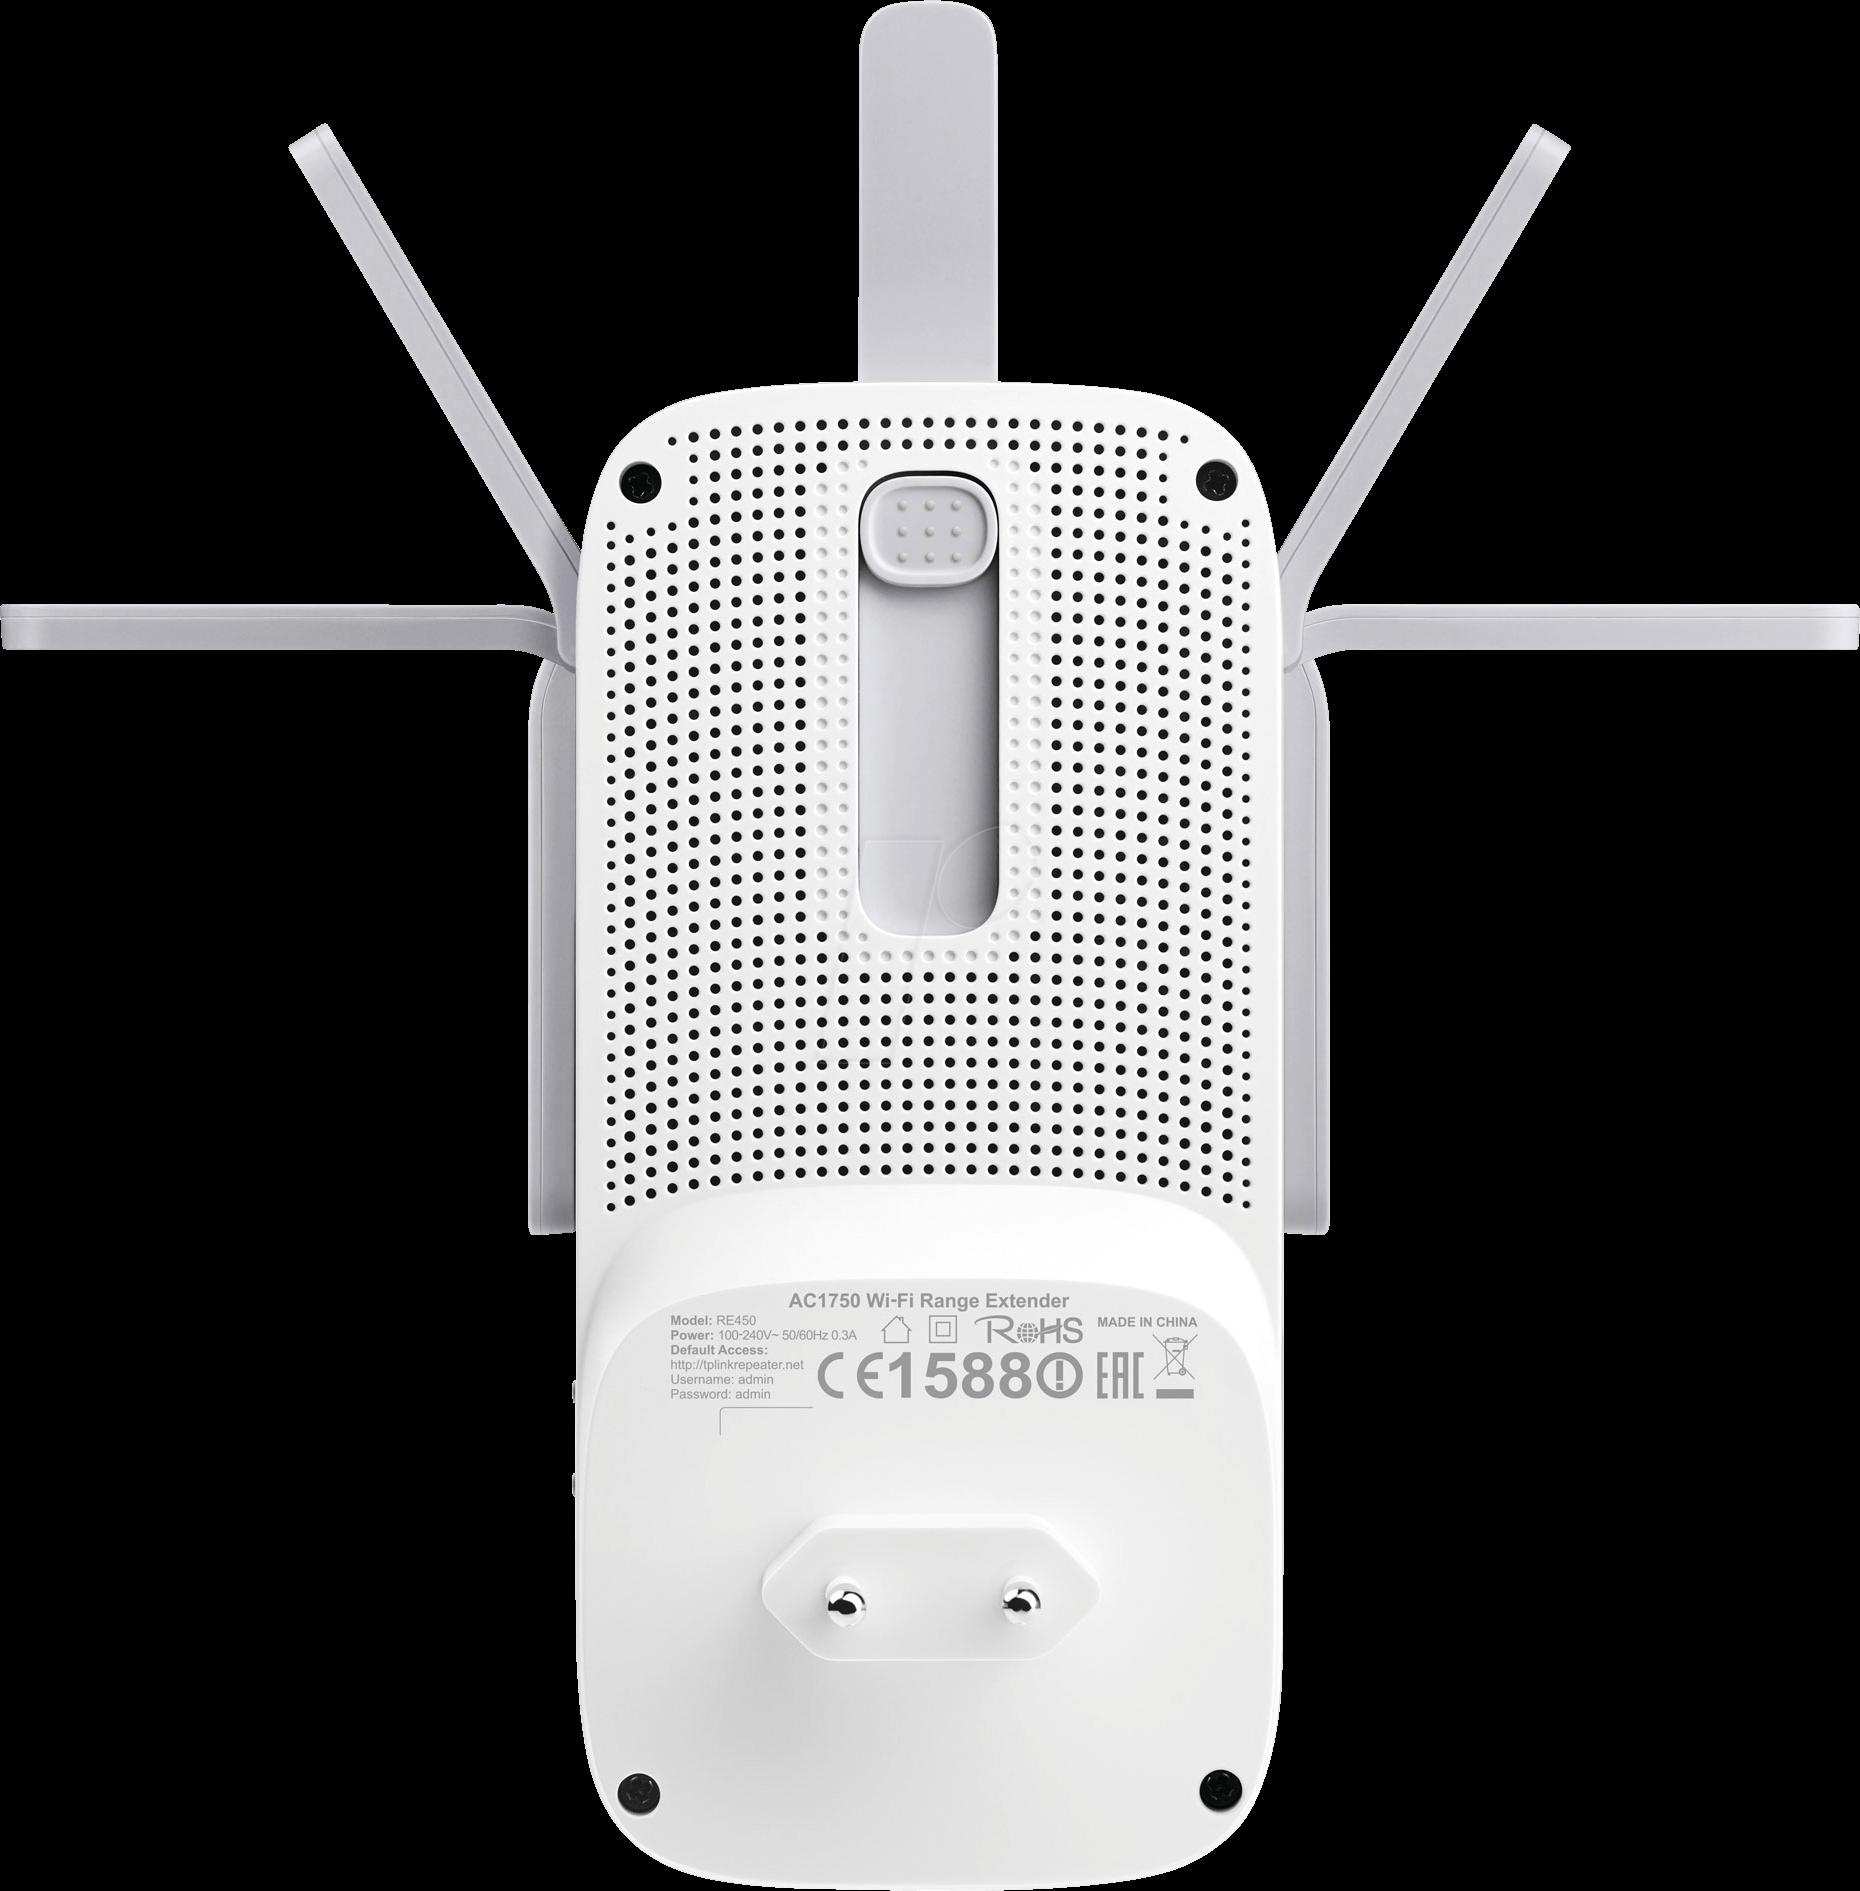 TPLINK RE450 - AC1750 Wi-Fi Range Extender